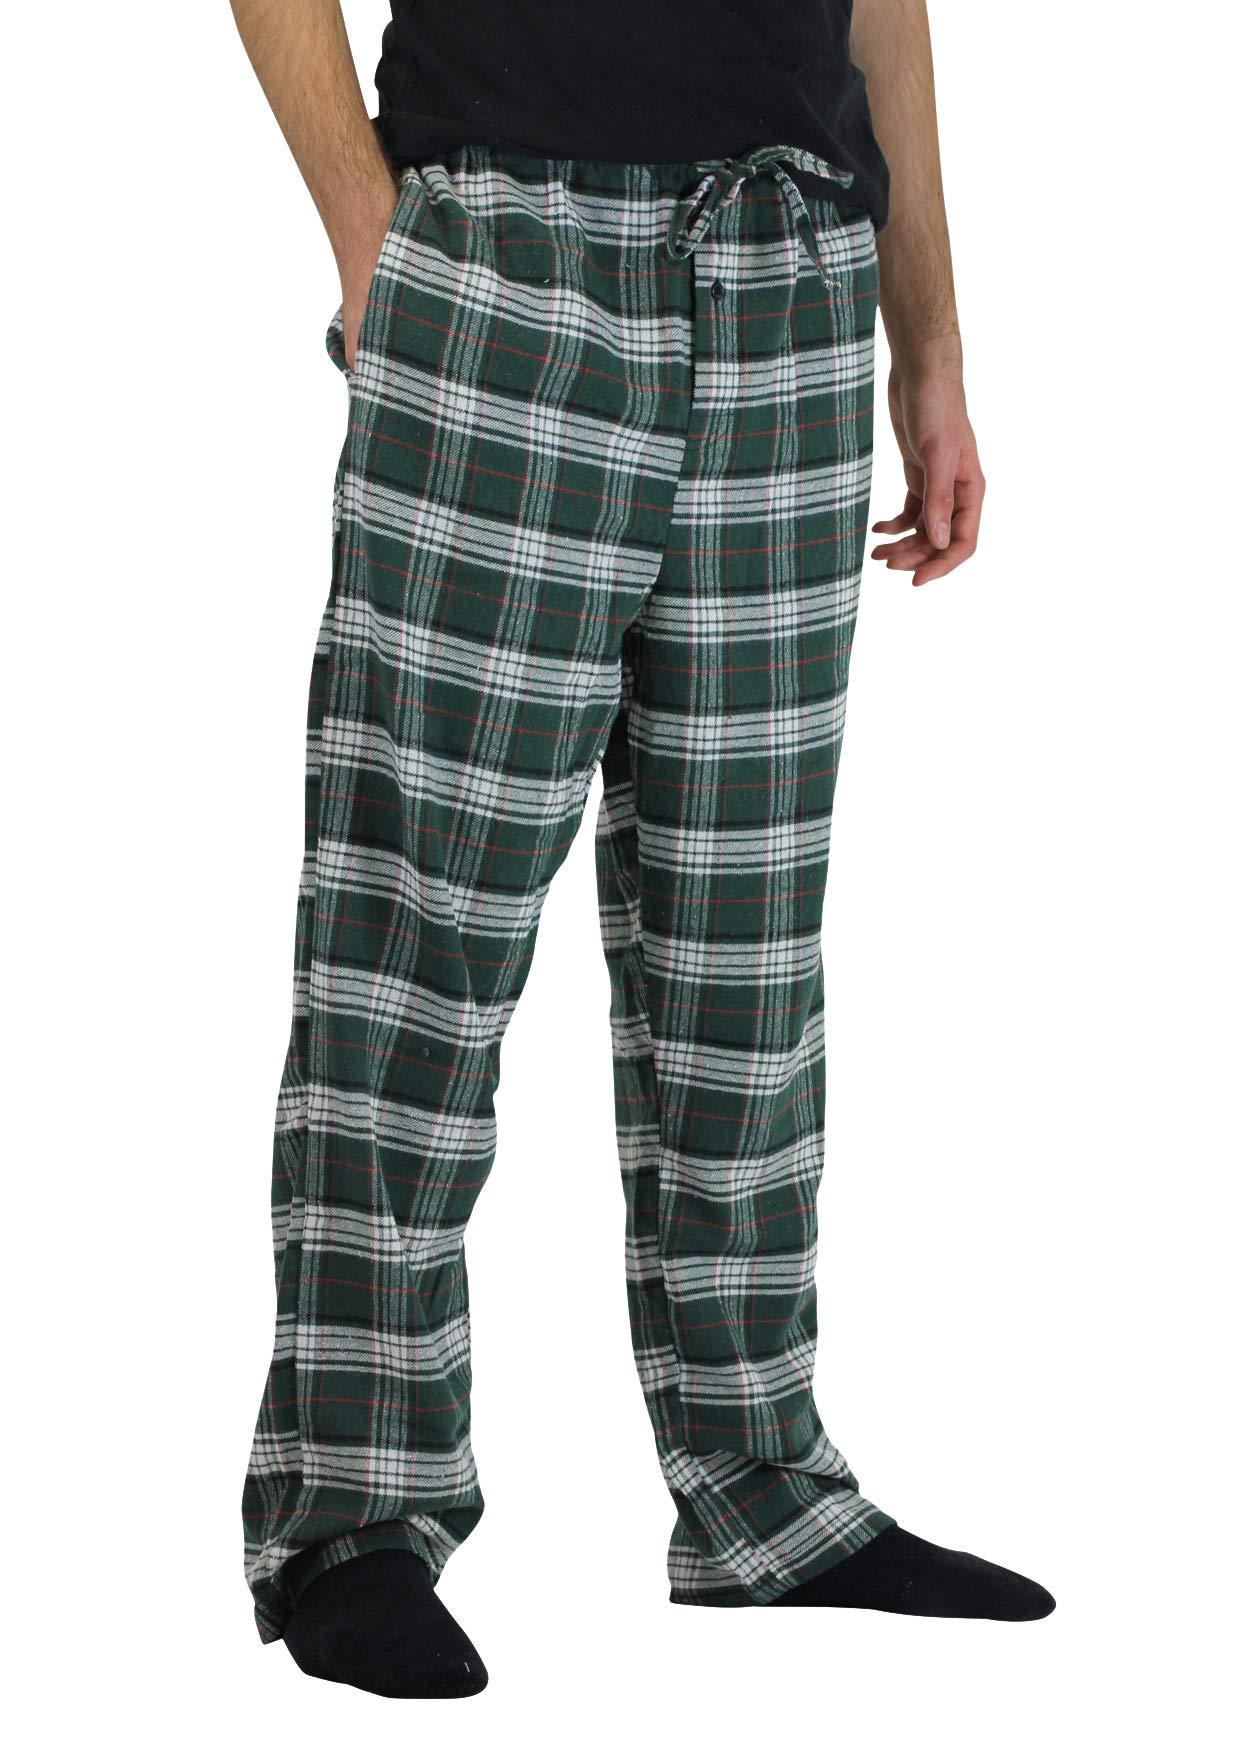 Real Essentials 3 Pack:Men's Cotton Super Soft Flannel Plaid Pajama Pants/Lounge Bottoms,Set 4-L by Real Essentials (Image #4)